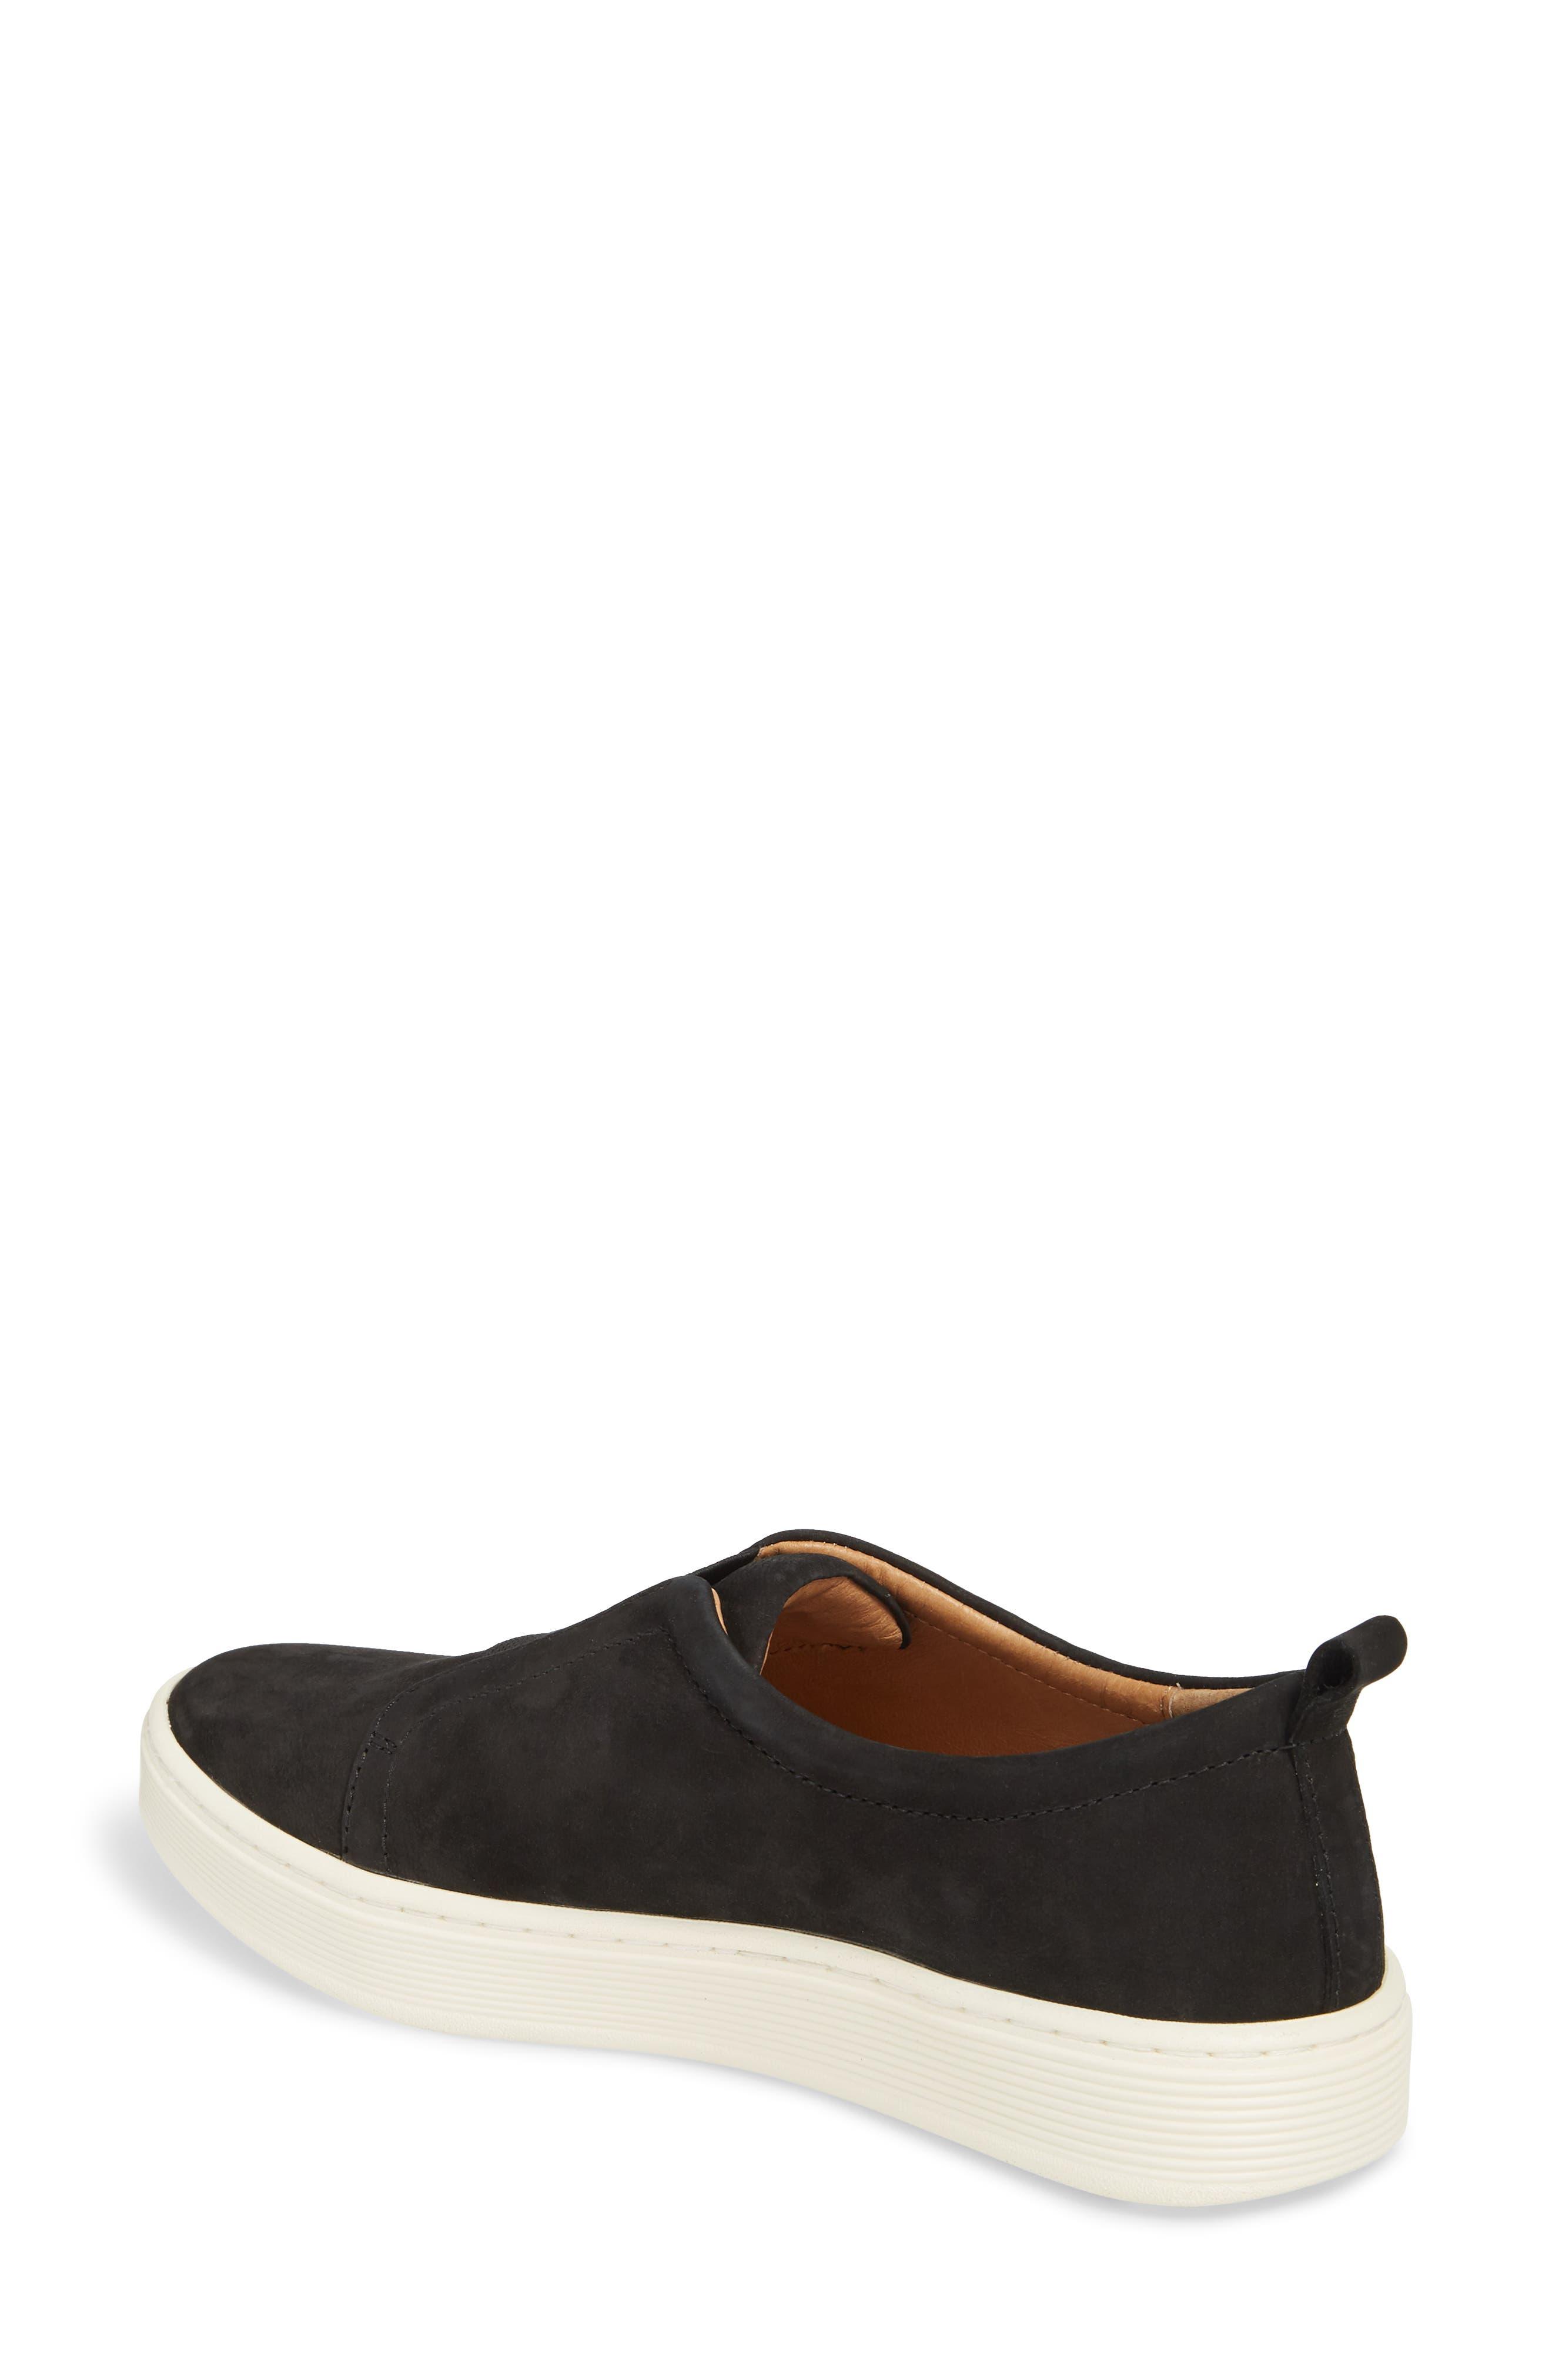 Safia Slip-On Sneaker,                             Alternate thumbnail 2, color,                             TRUE BLACK LEATHER